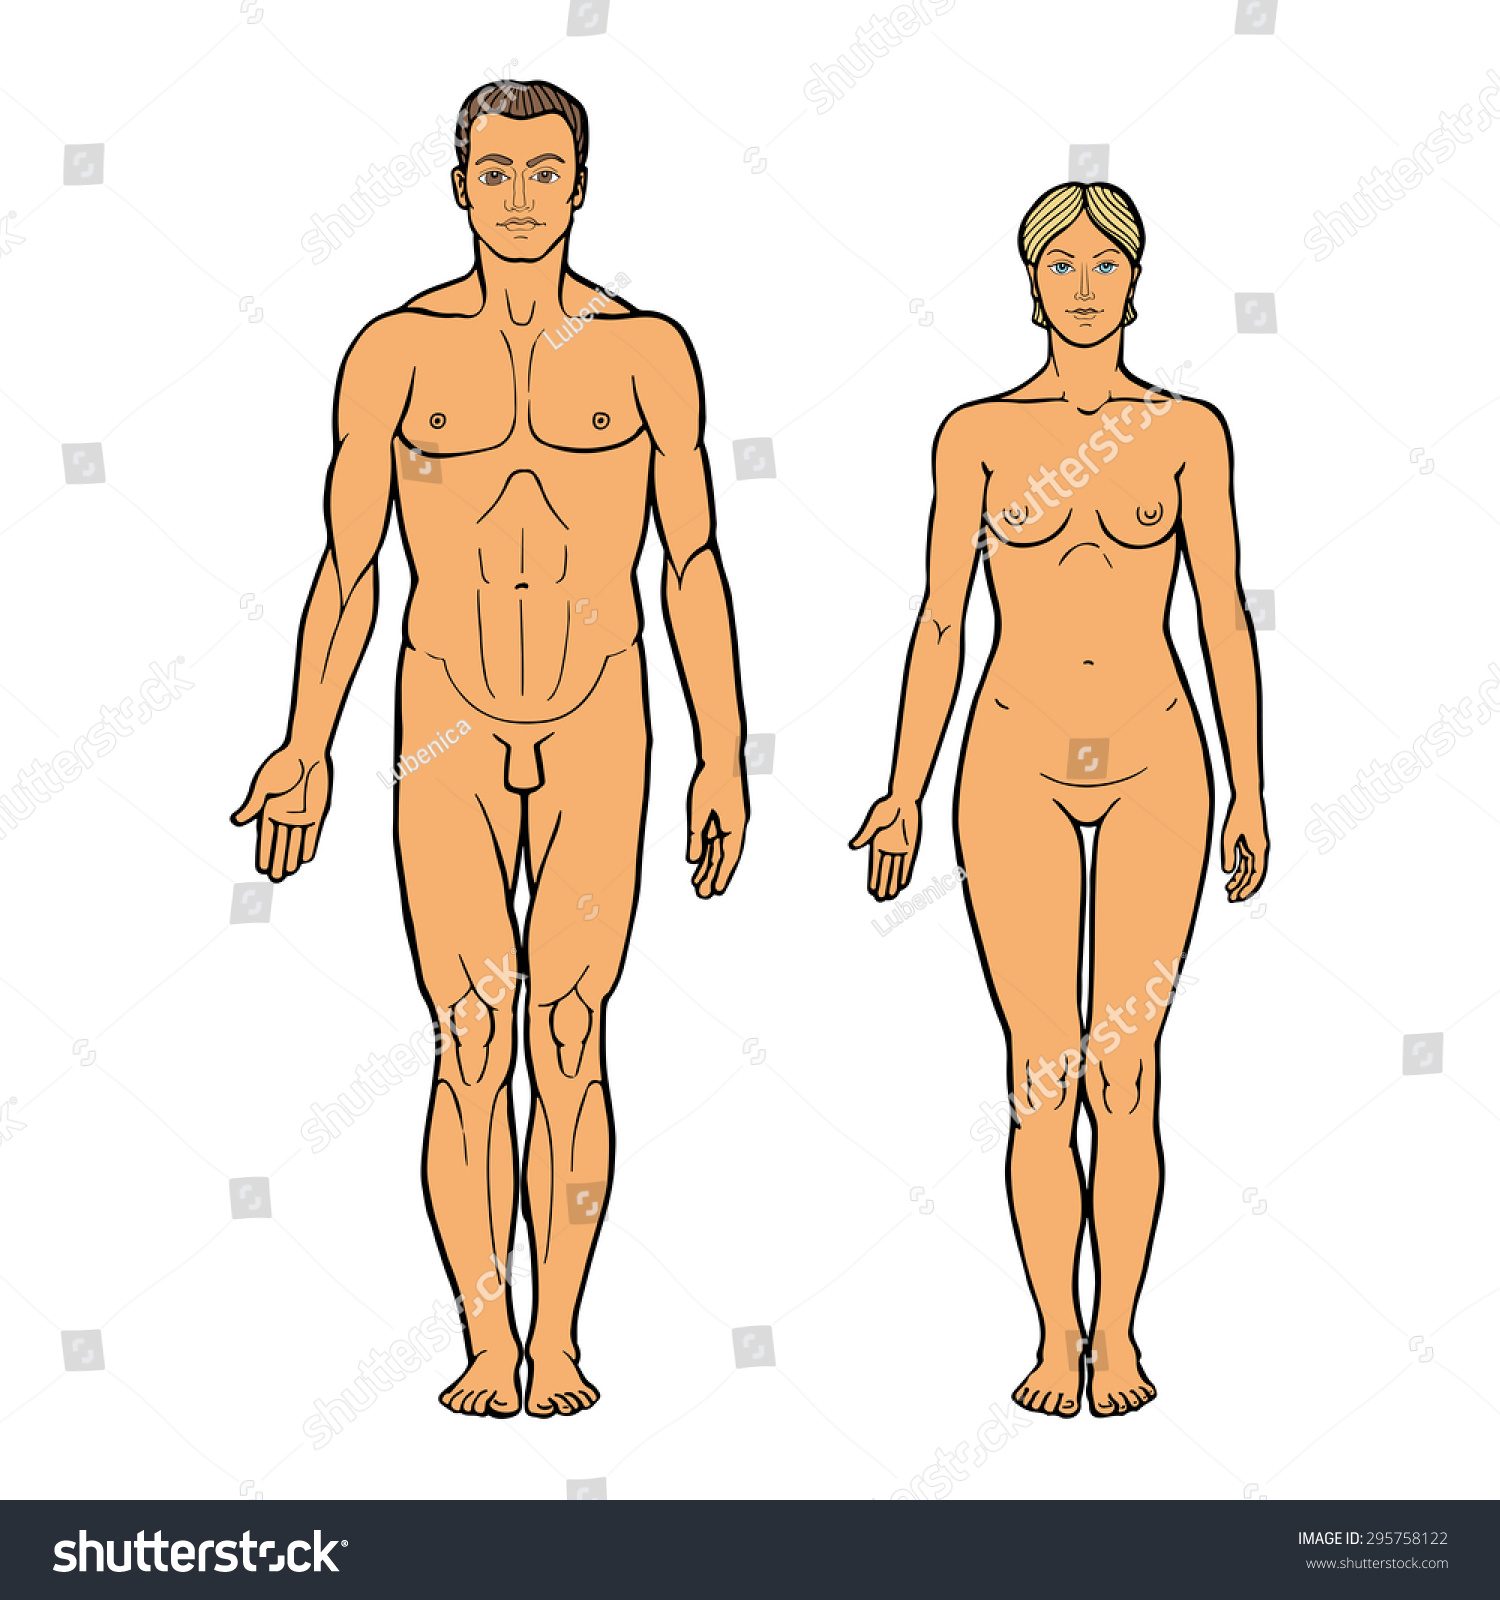 naked man and woman drawing